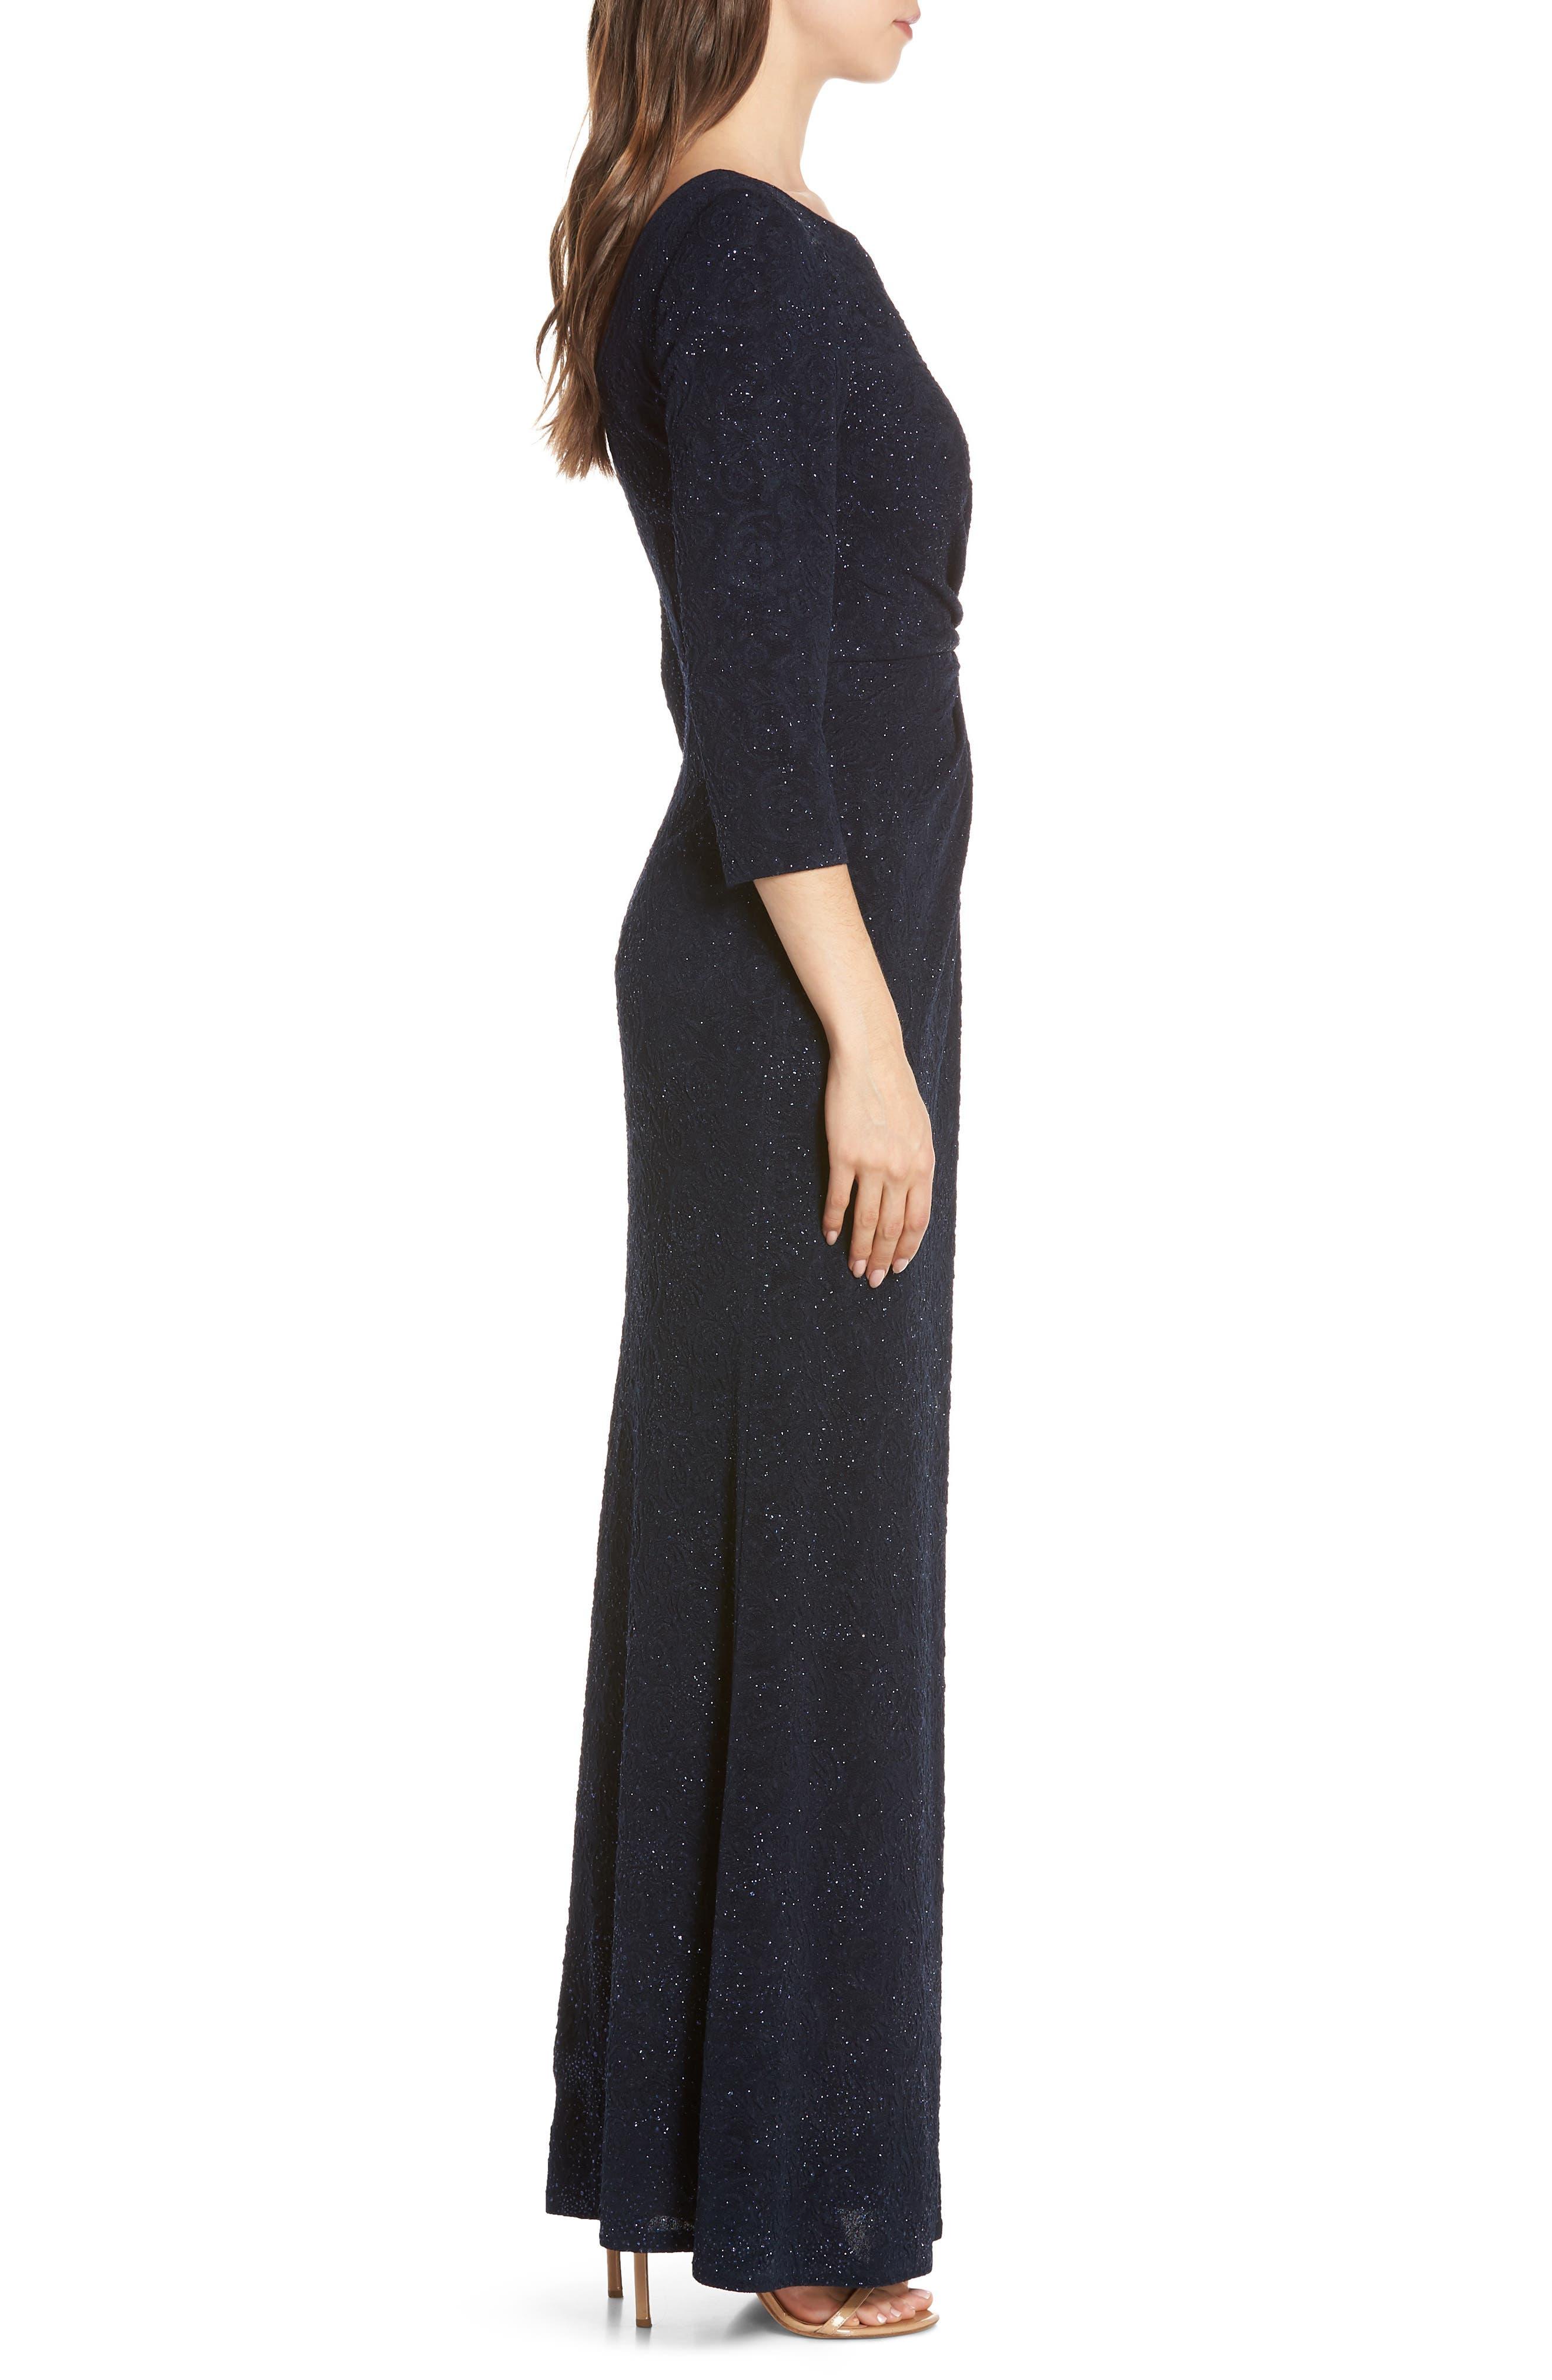 ALEX EVENINGS, Knot Front Sequin Jacquard Evening Dress, Alternate thumbnail 4, color, NAVY